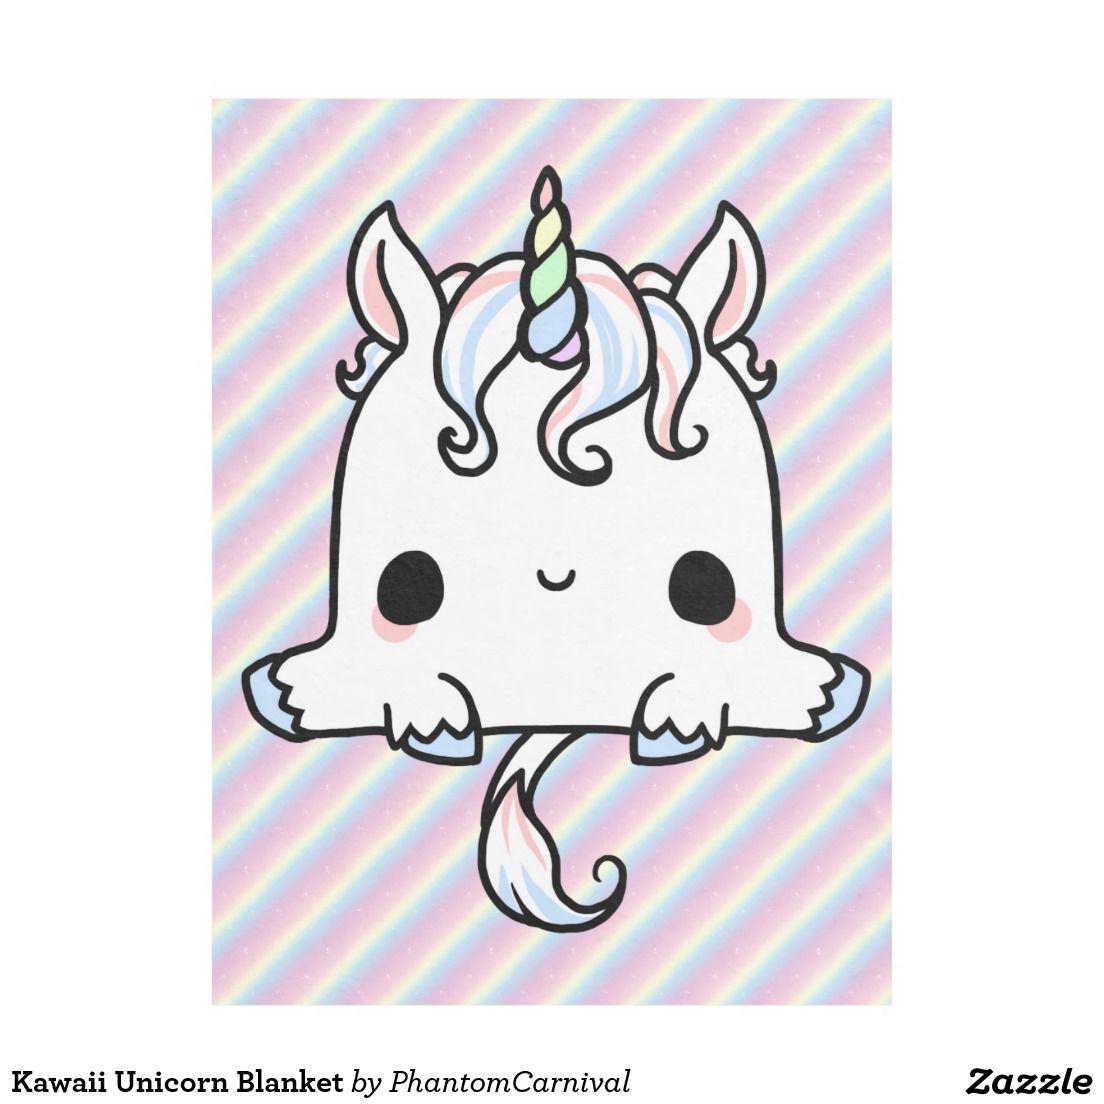 Kawaii Unicorn Blanket | Zazzle.com | Cute kawaii drawings, Unicorn drawing, Unicorn pictures